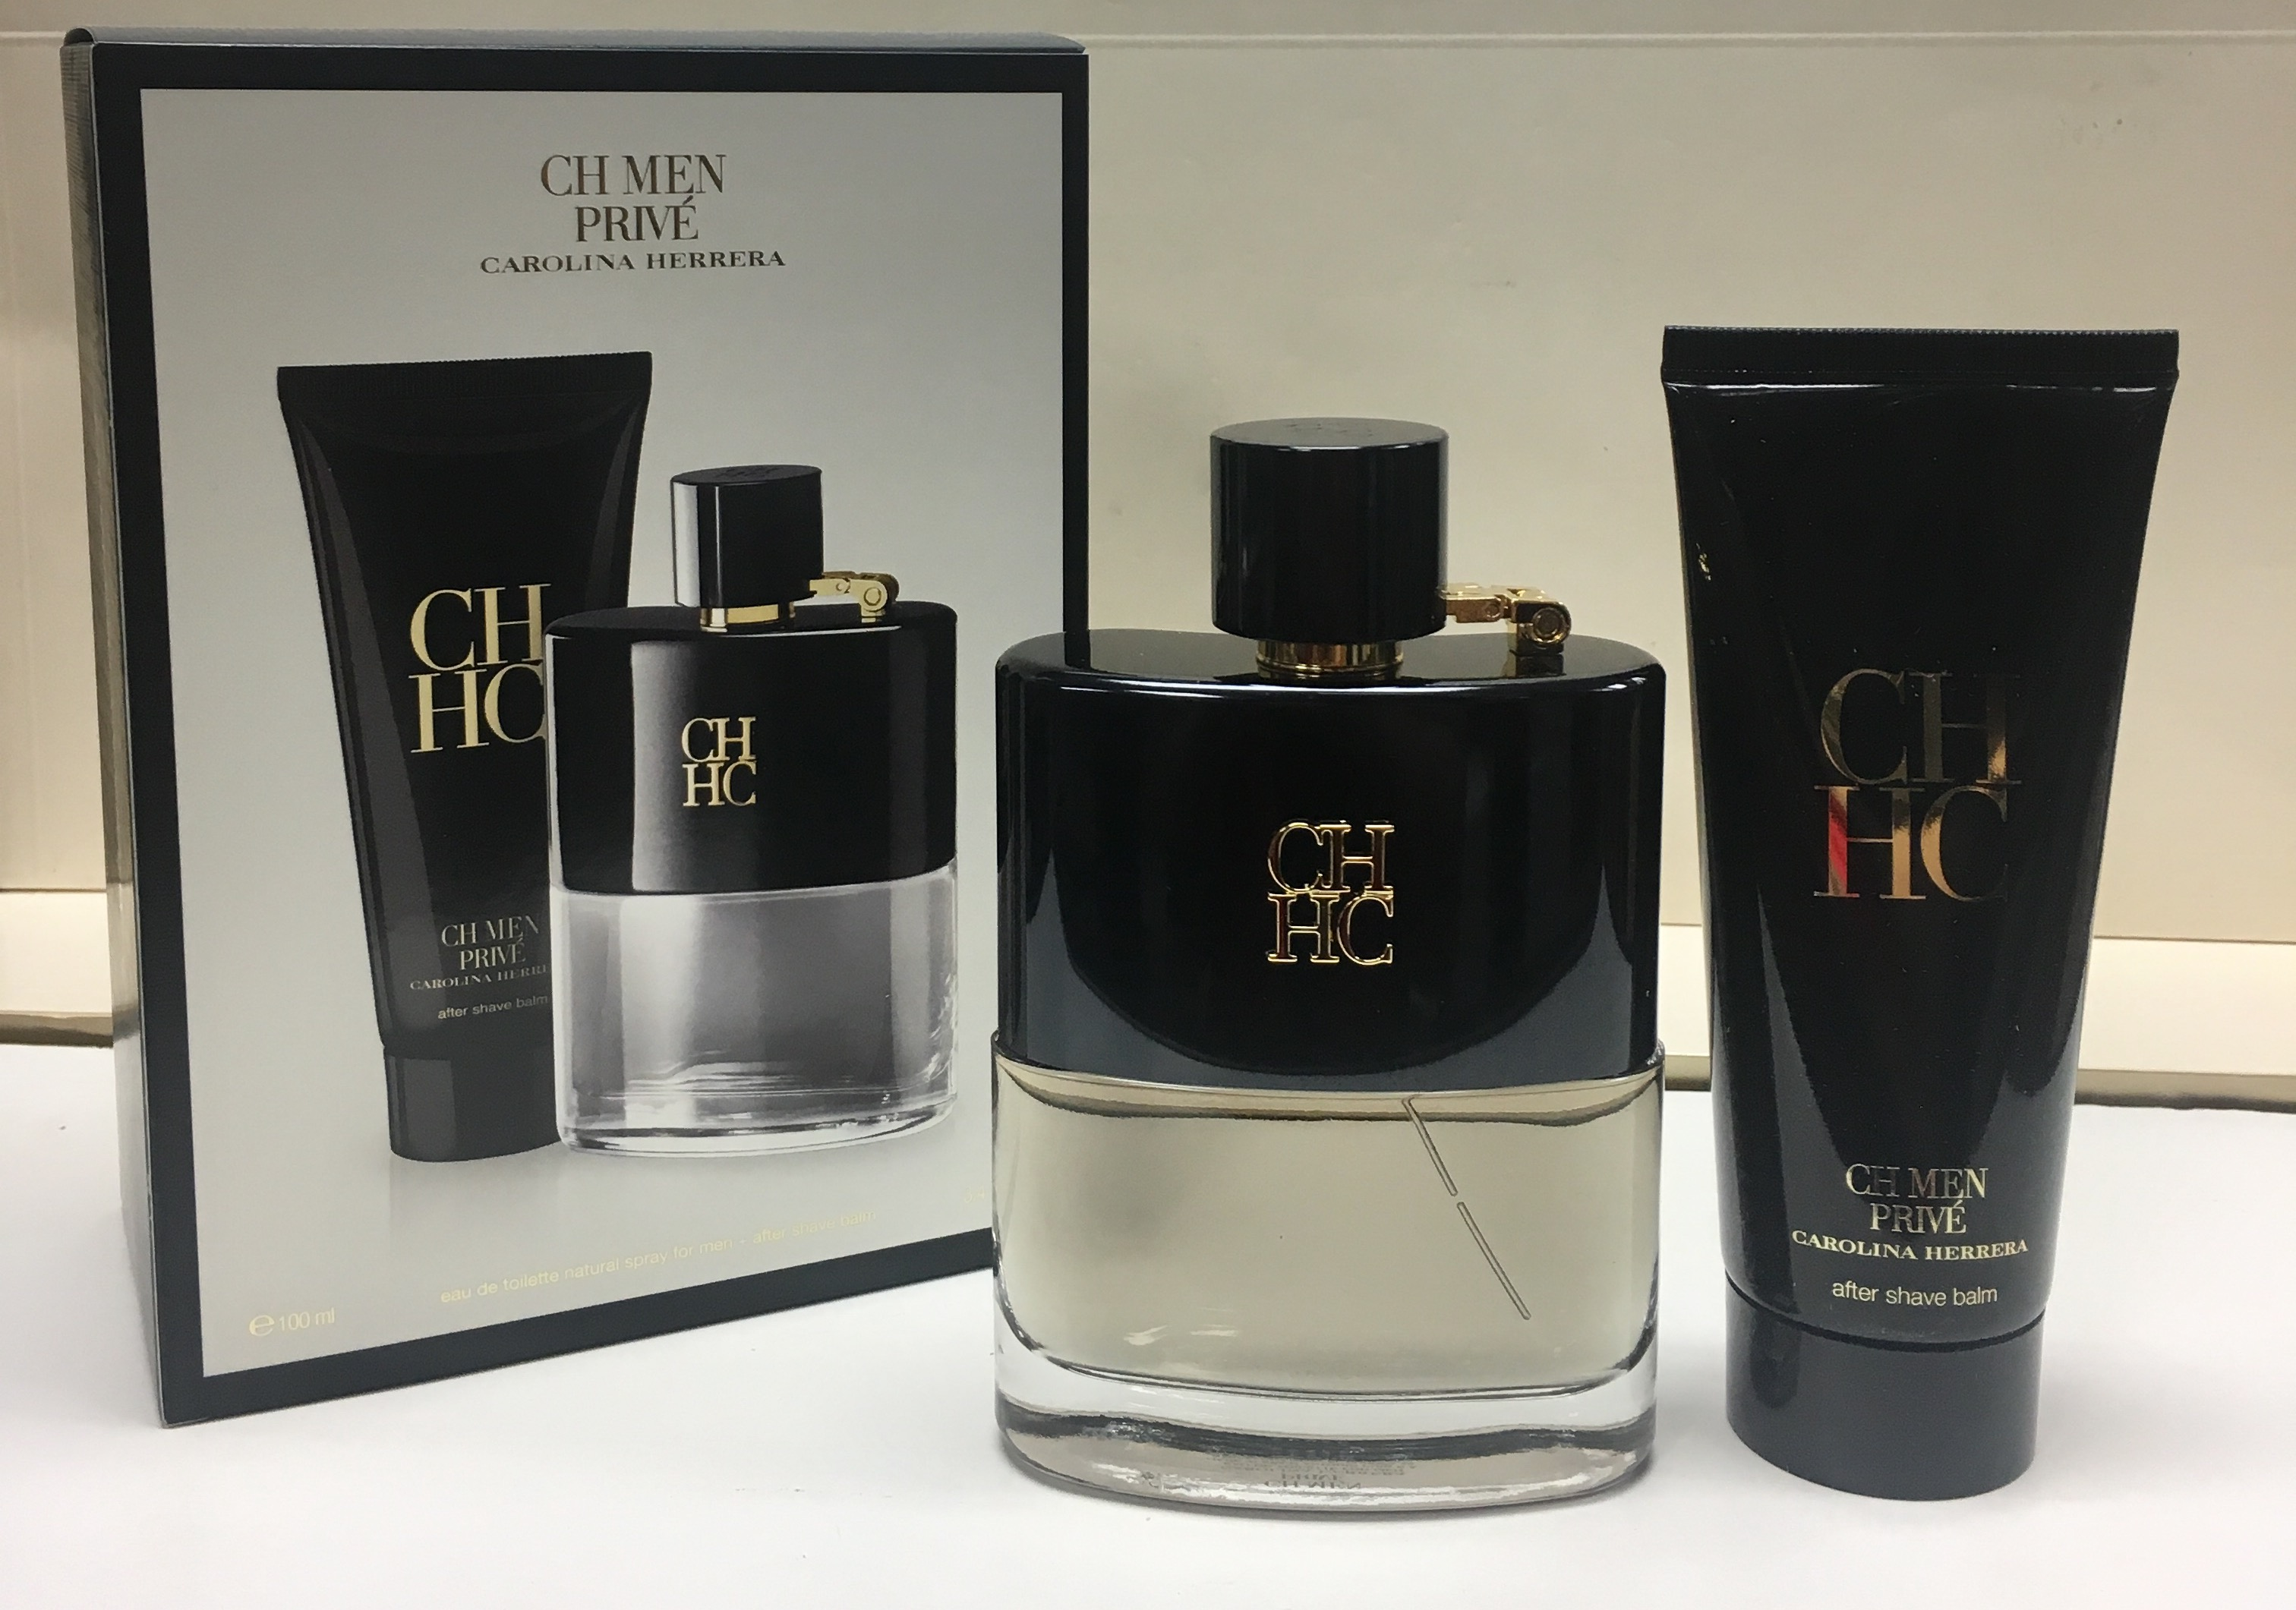 Carolina Herrera - Carolina Herrera, CH Men Prive, Eau de Toilette, 2 Piece  Gift Set for Men - Walmart.com 06a48fe5a0